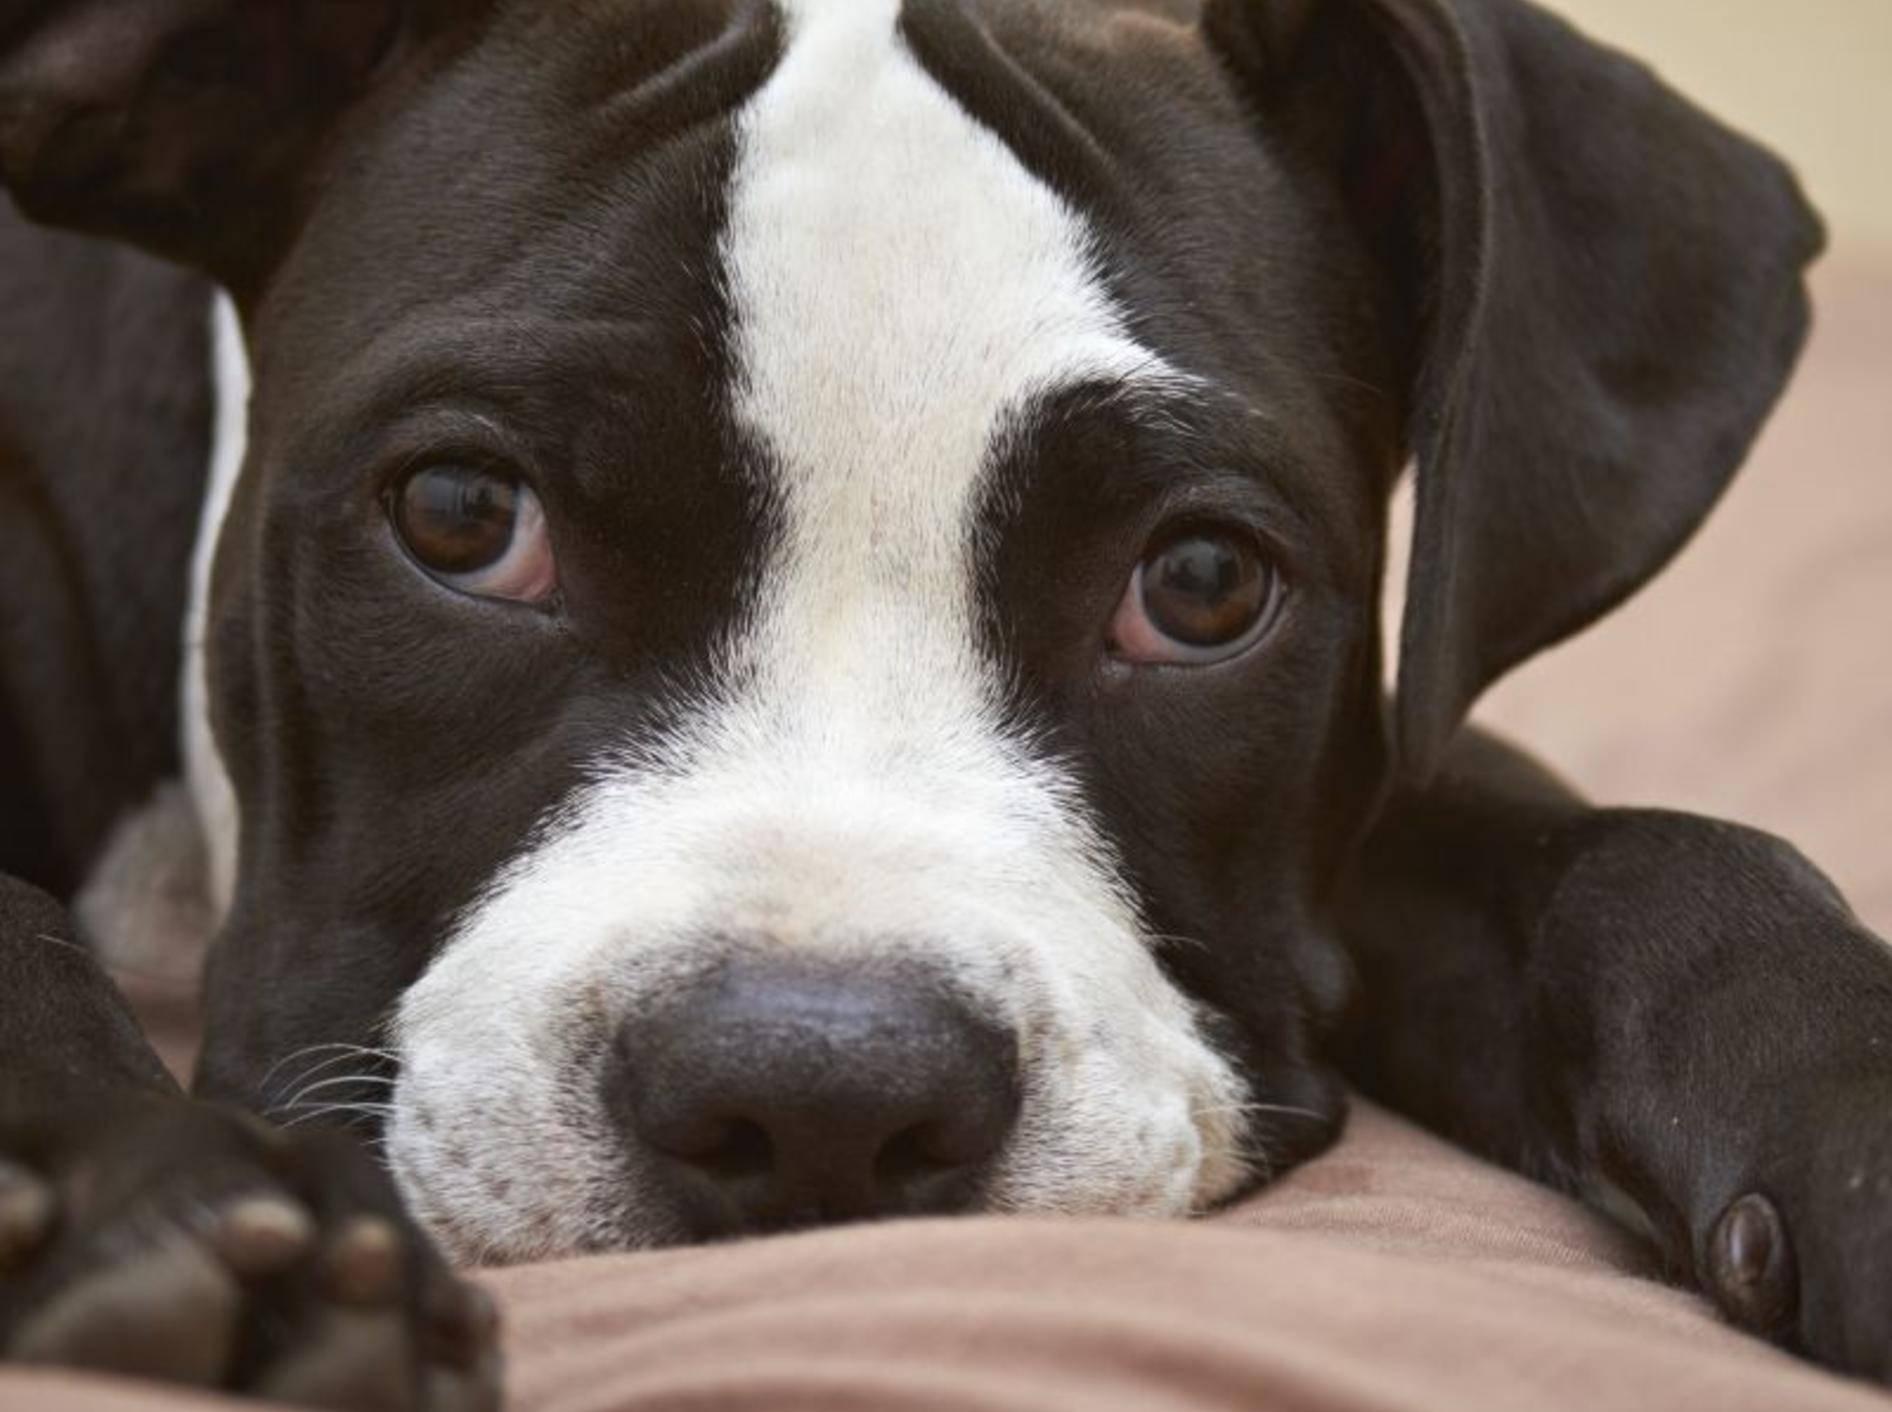 1. Pitbull Terrier — Bild: Shutterstock / dogboxstudio